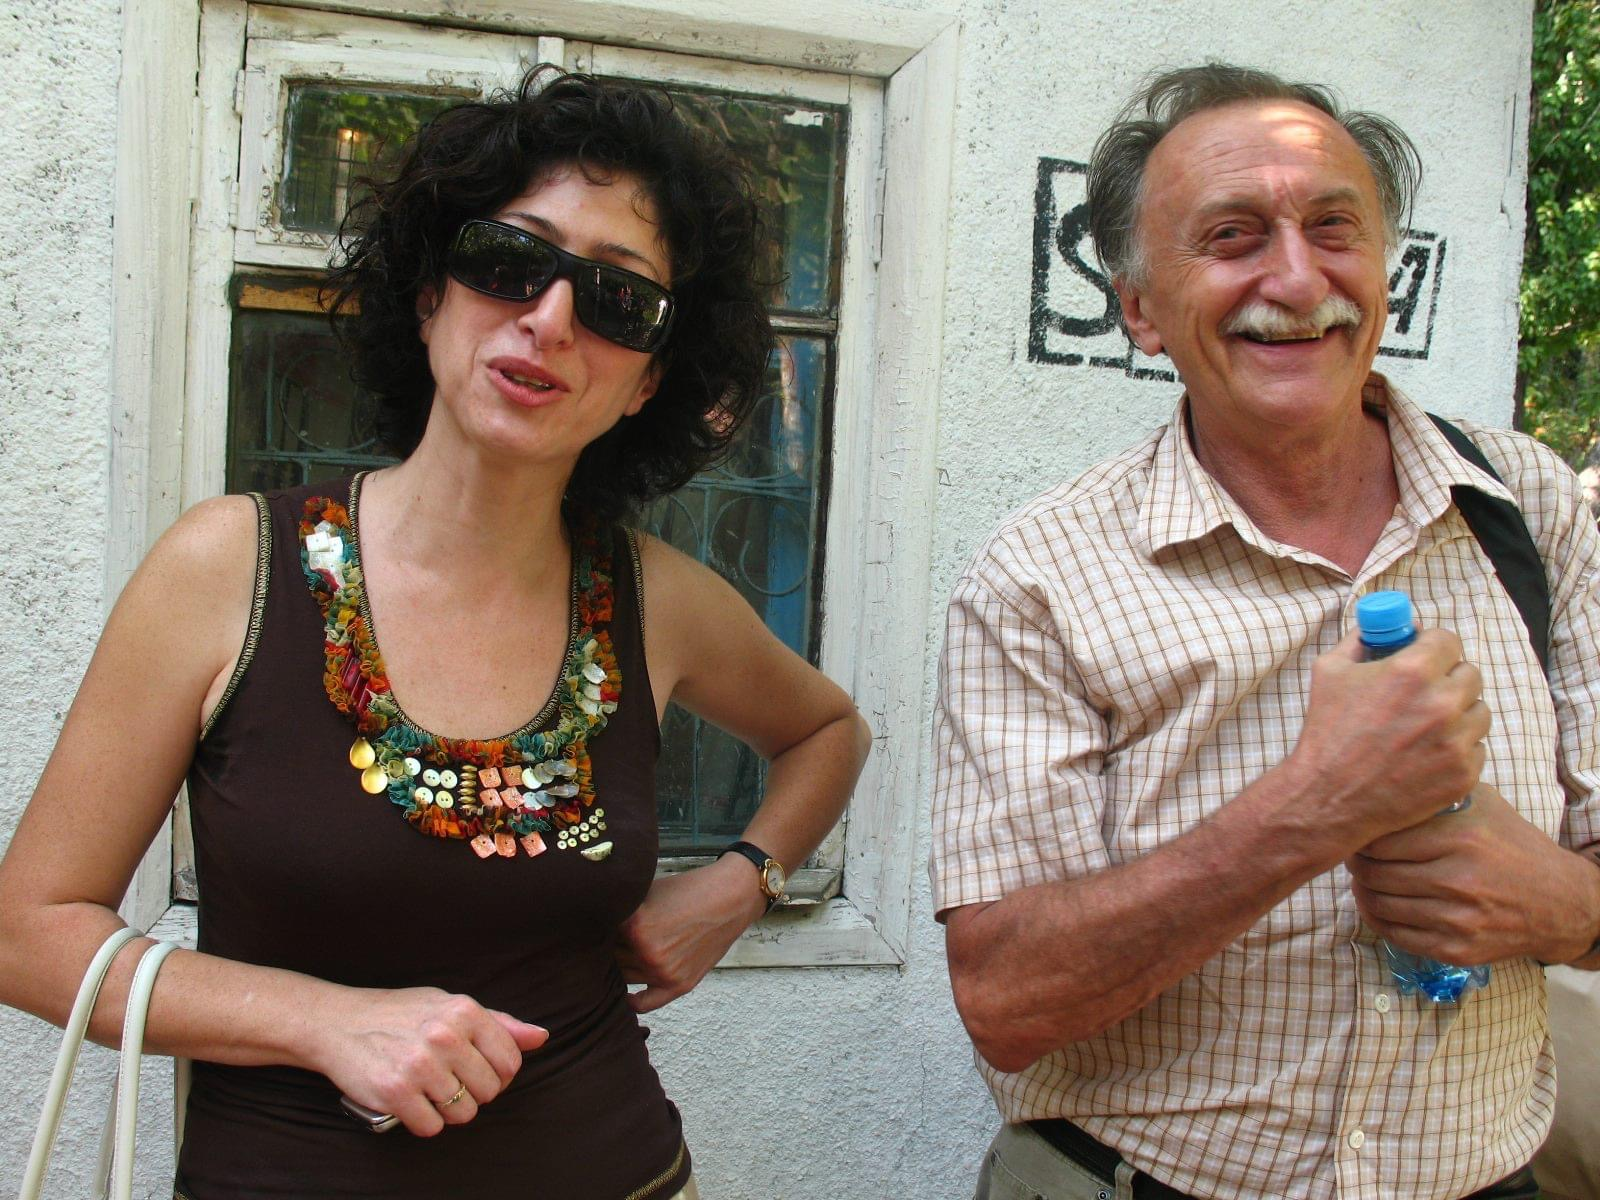 Тетяна Тумасян та Борис Михайлов. Фото надане Тетяною Тумасян